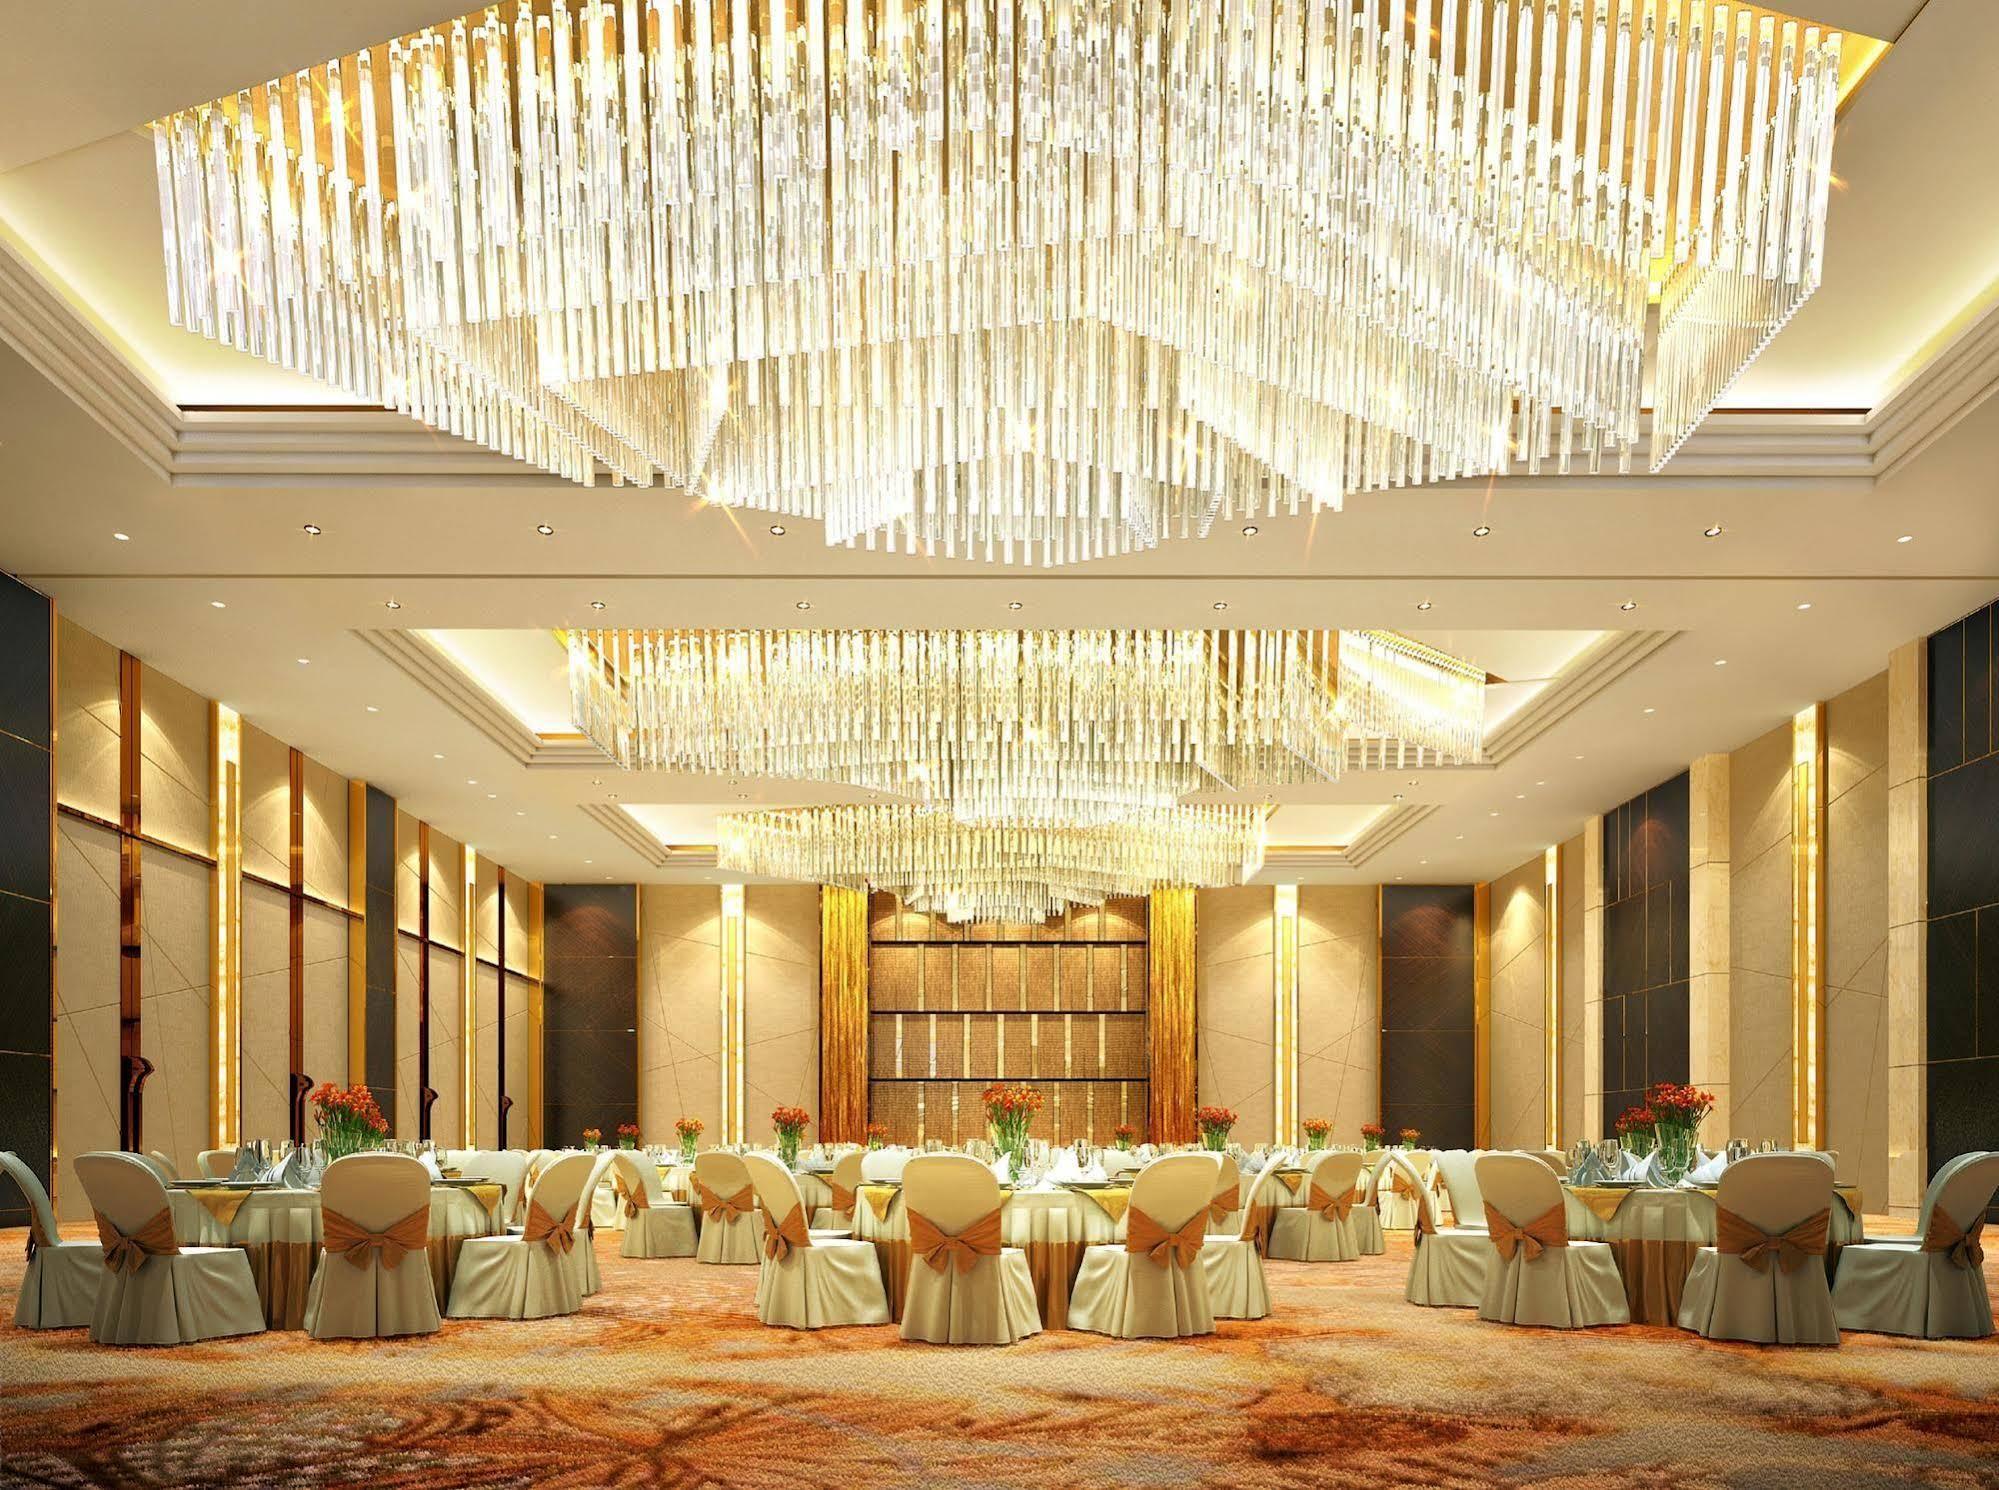 Hilton Yantai